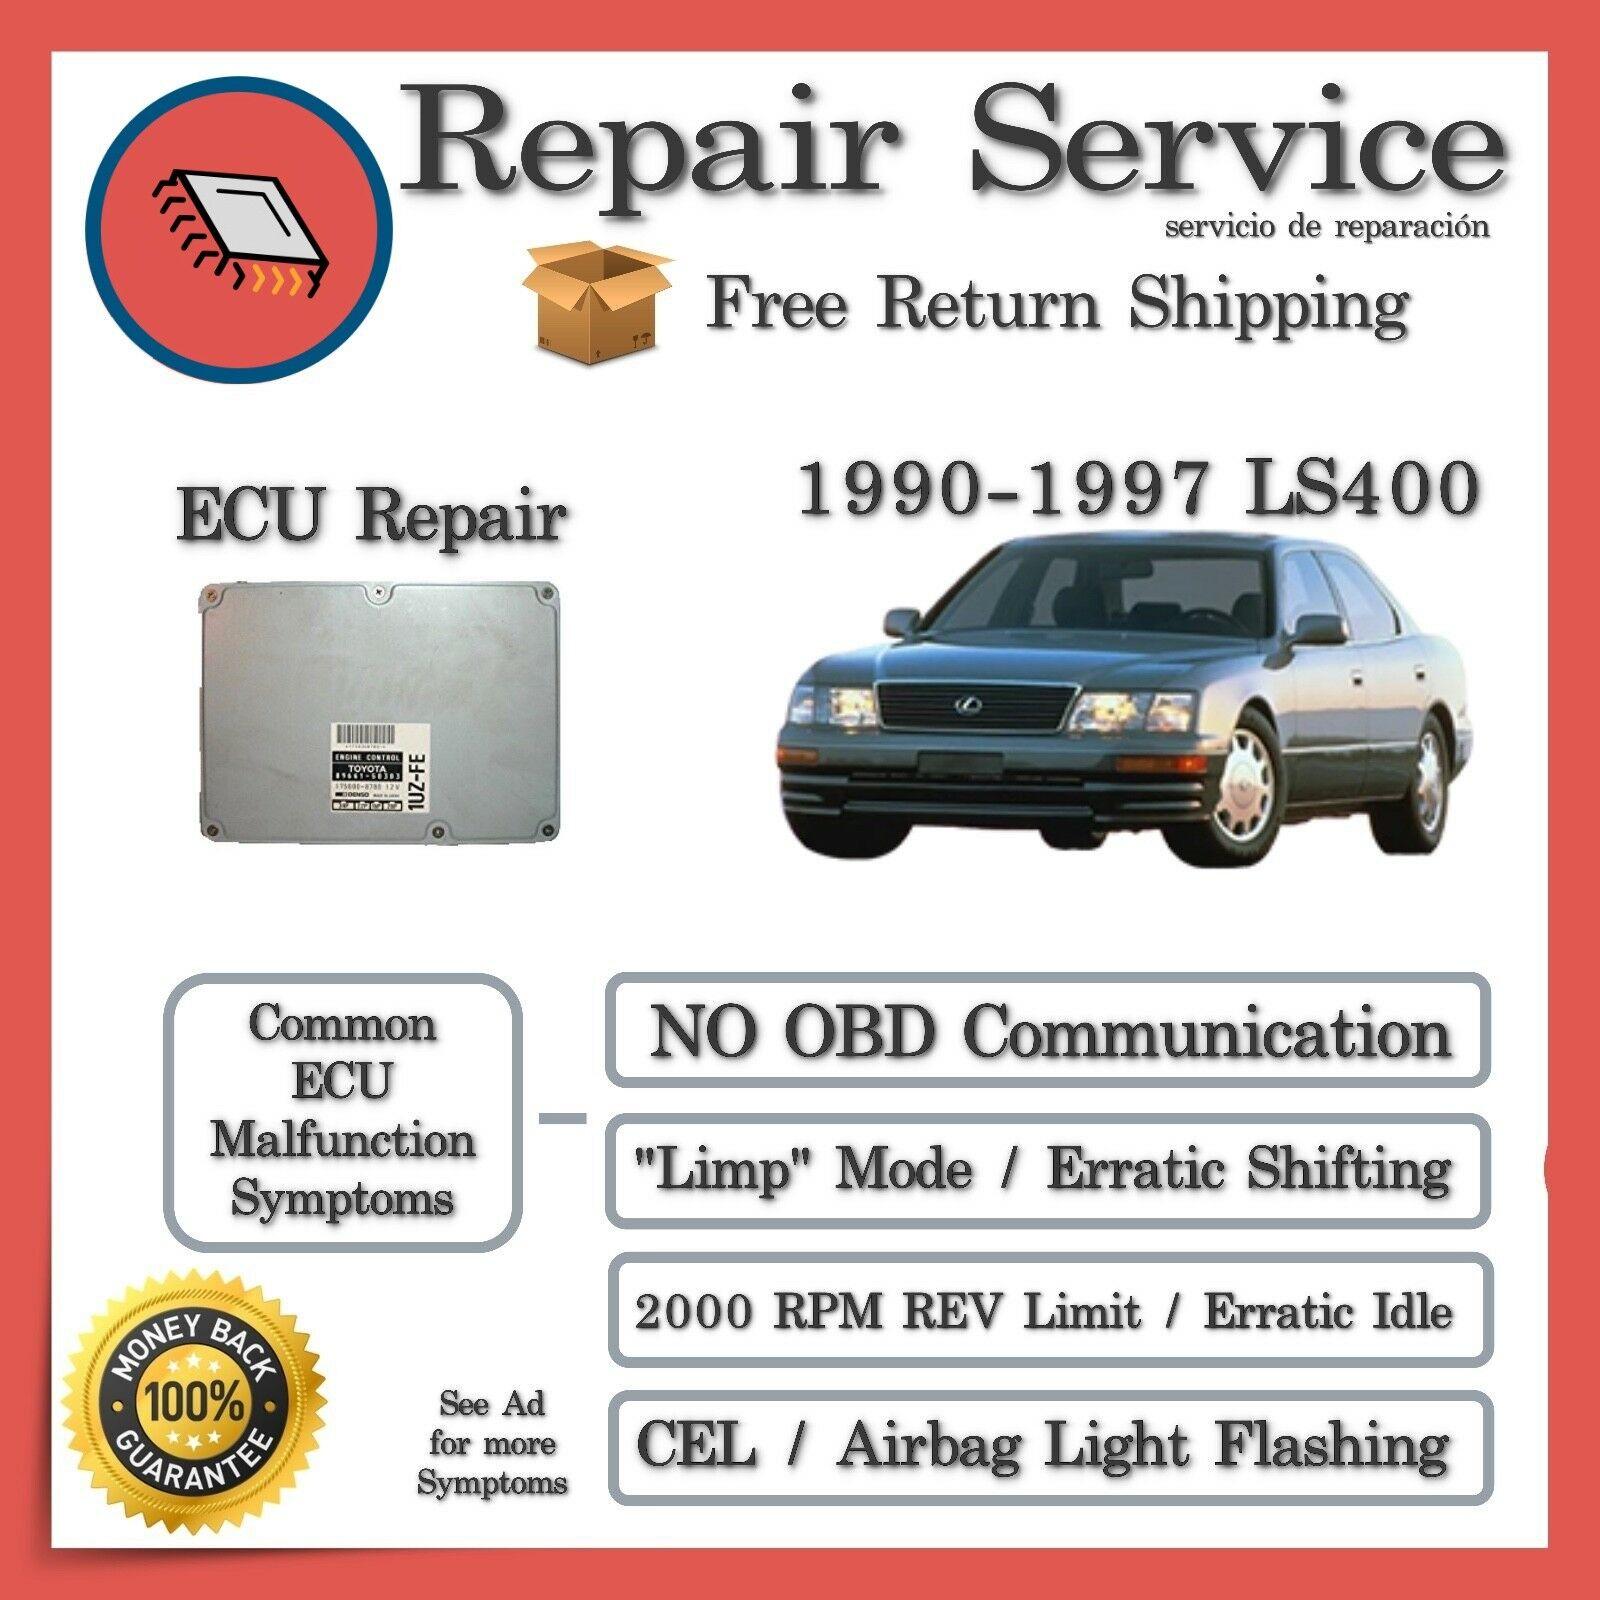 ✅ ECU ECM Computer REPAIR | Lexus LS400 1990 1991 1992 1993 1994 1995 1996 1997